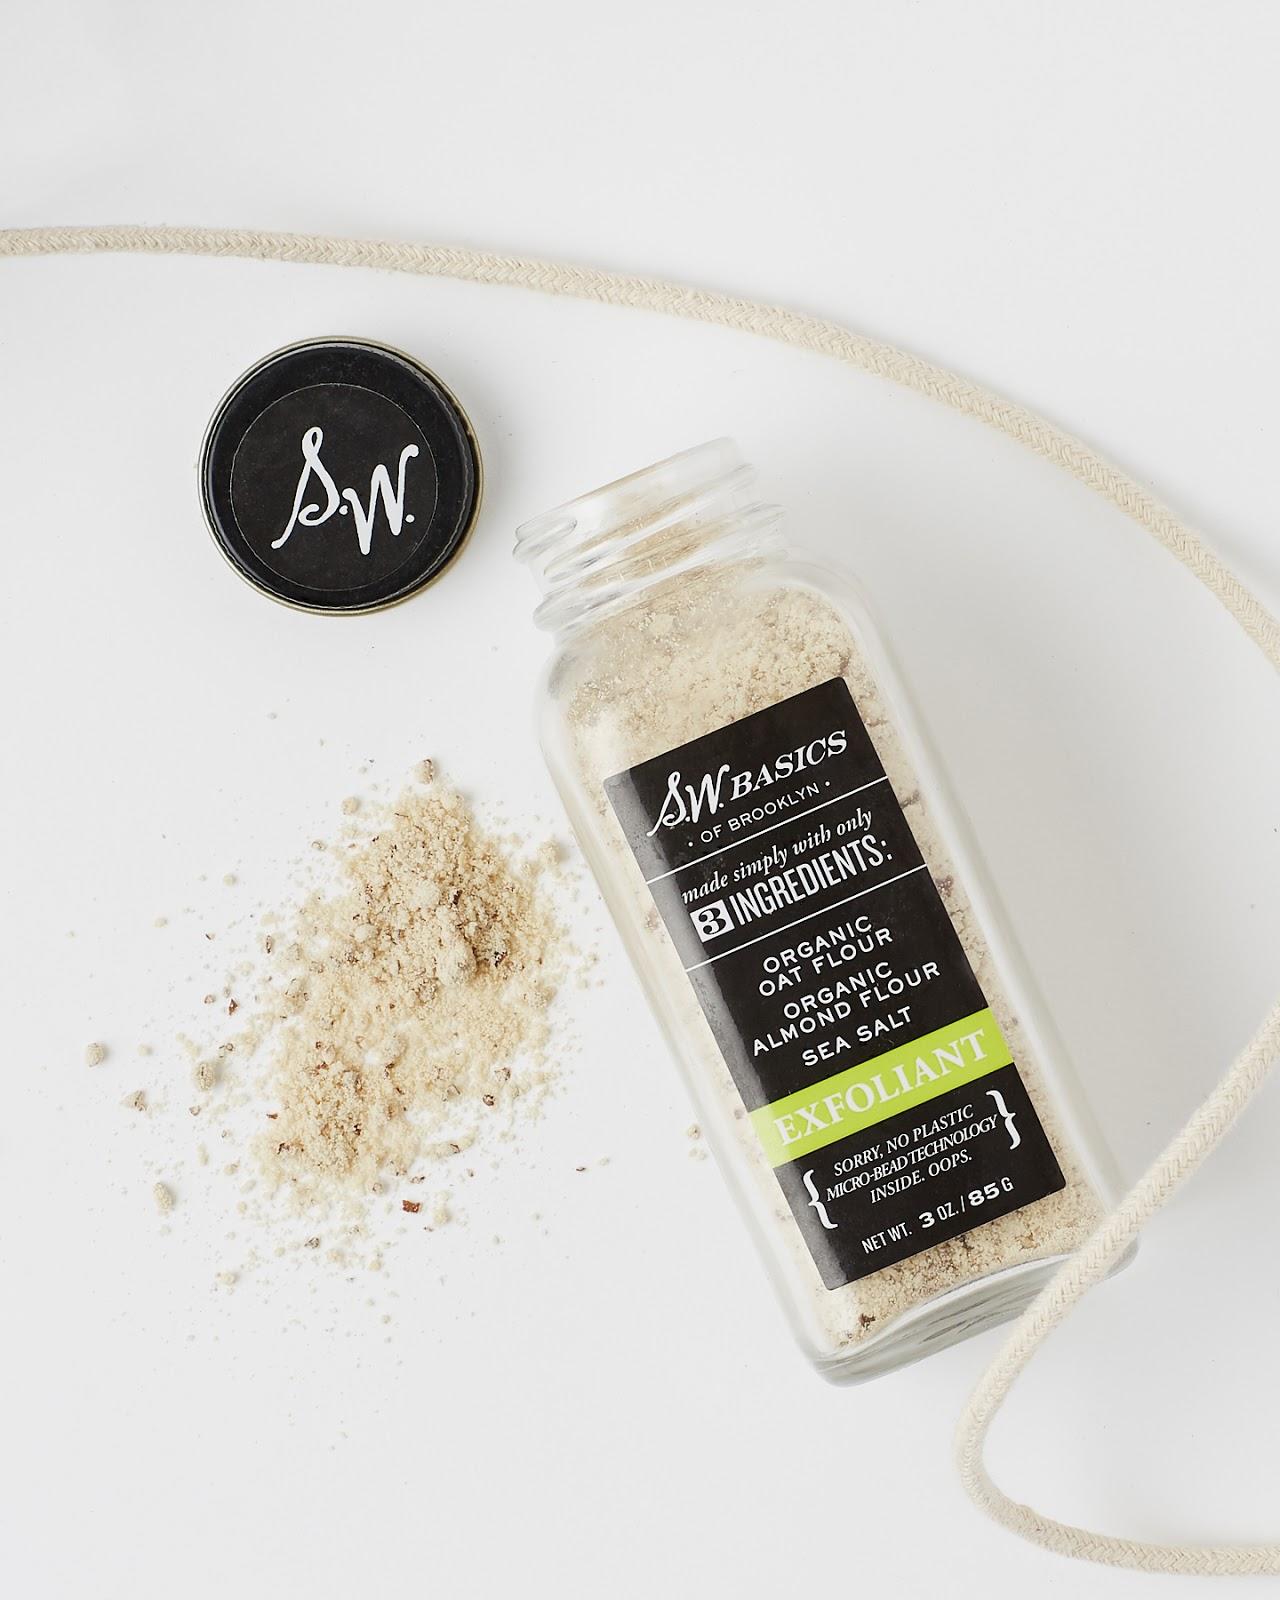 S.W. Basics Exfoliant Review organic skincare oat almond flour hellolindasau